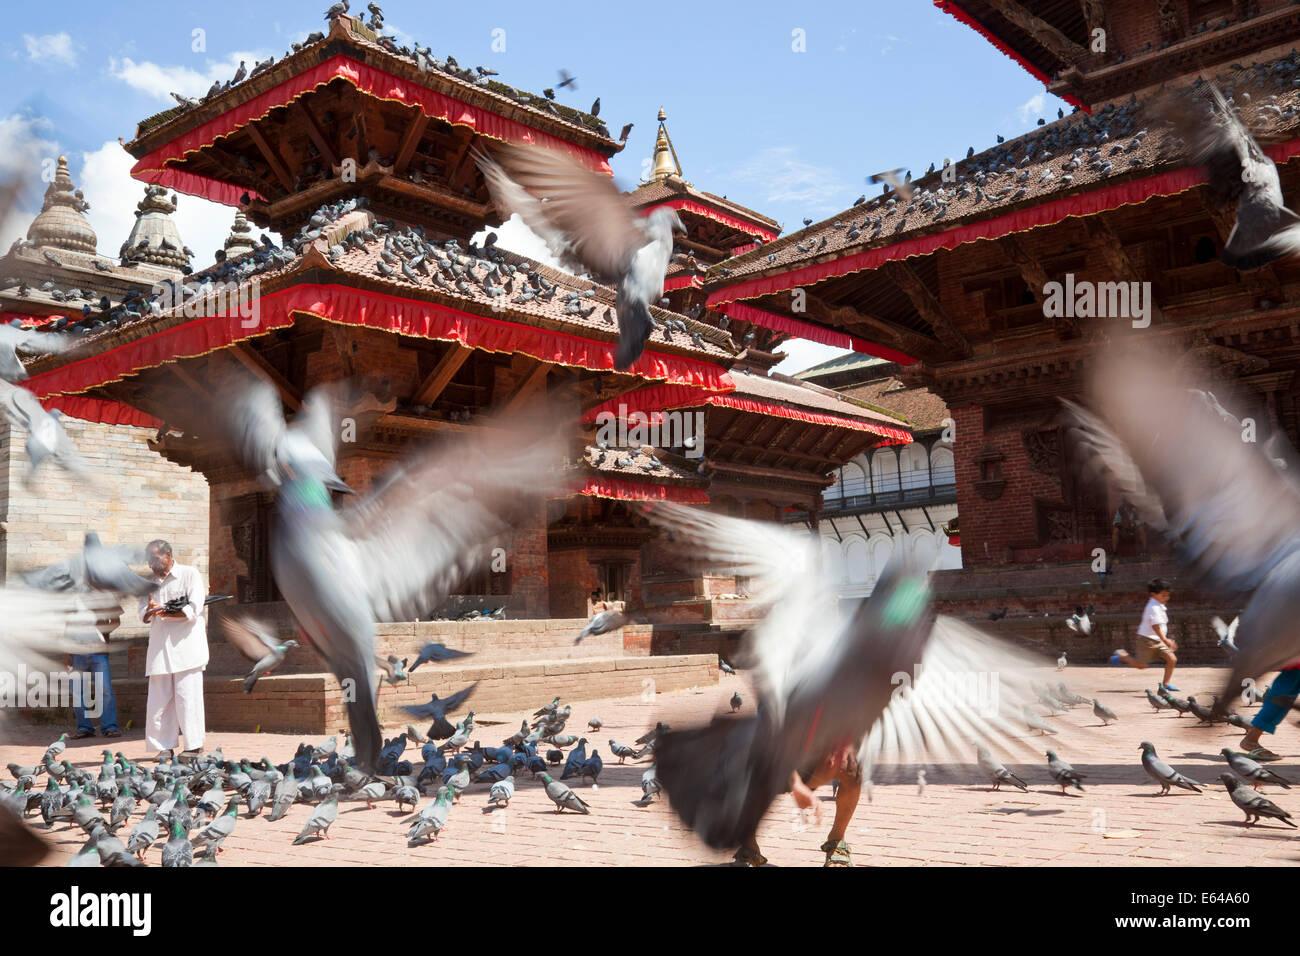 Pigeons, Durbar Square, Kathmandu, Nepal - Stock Image